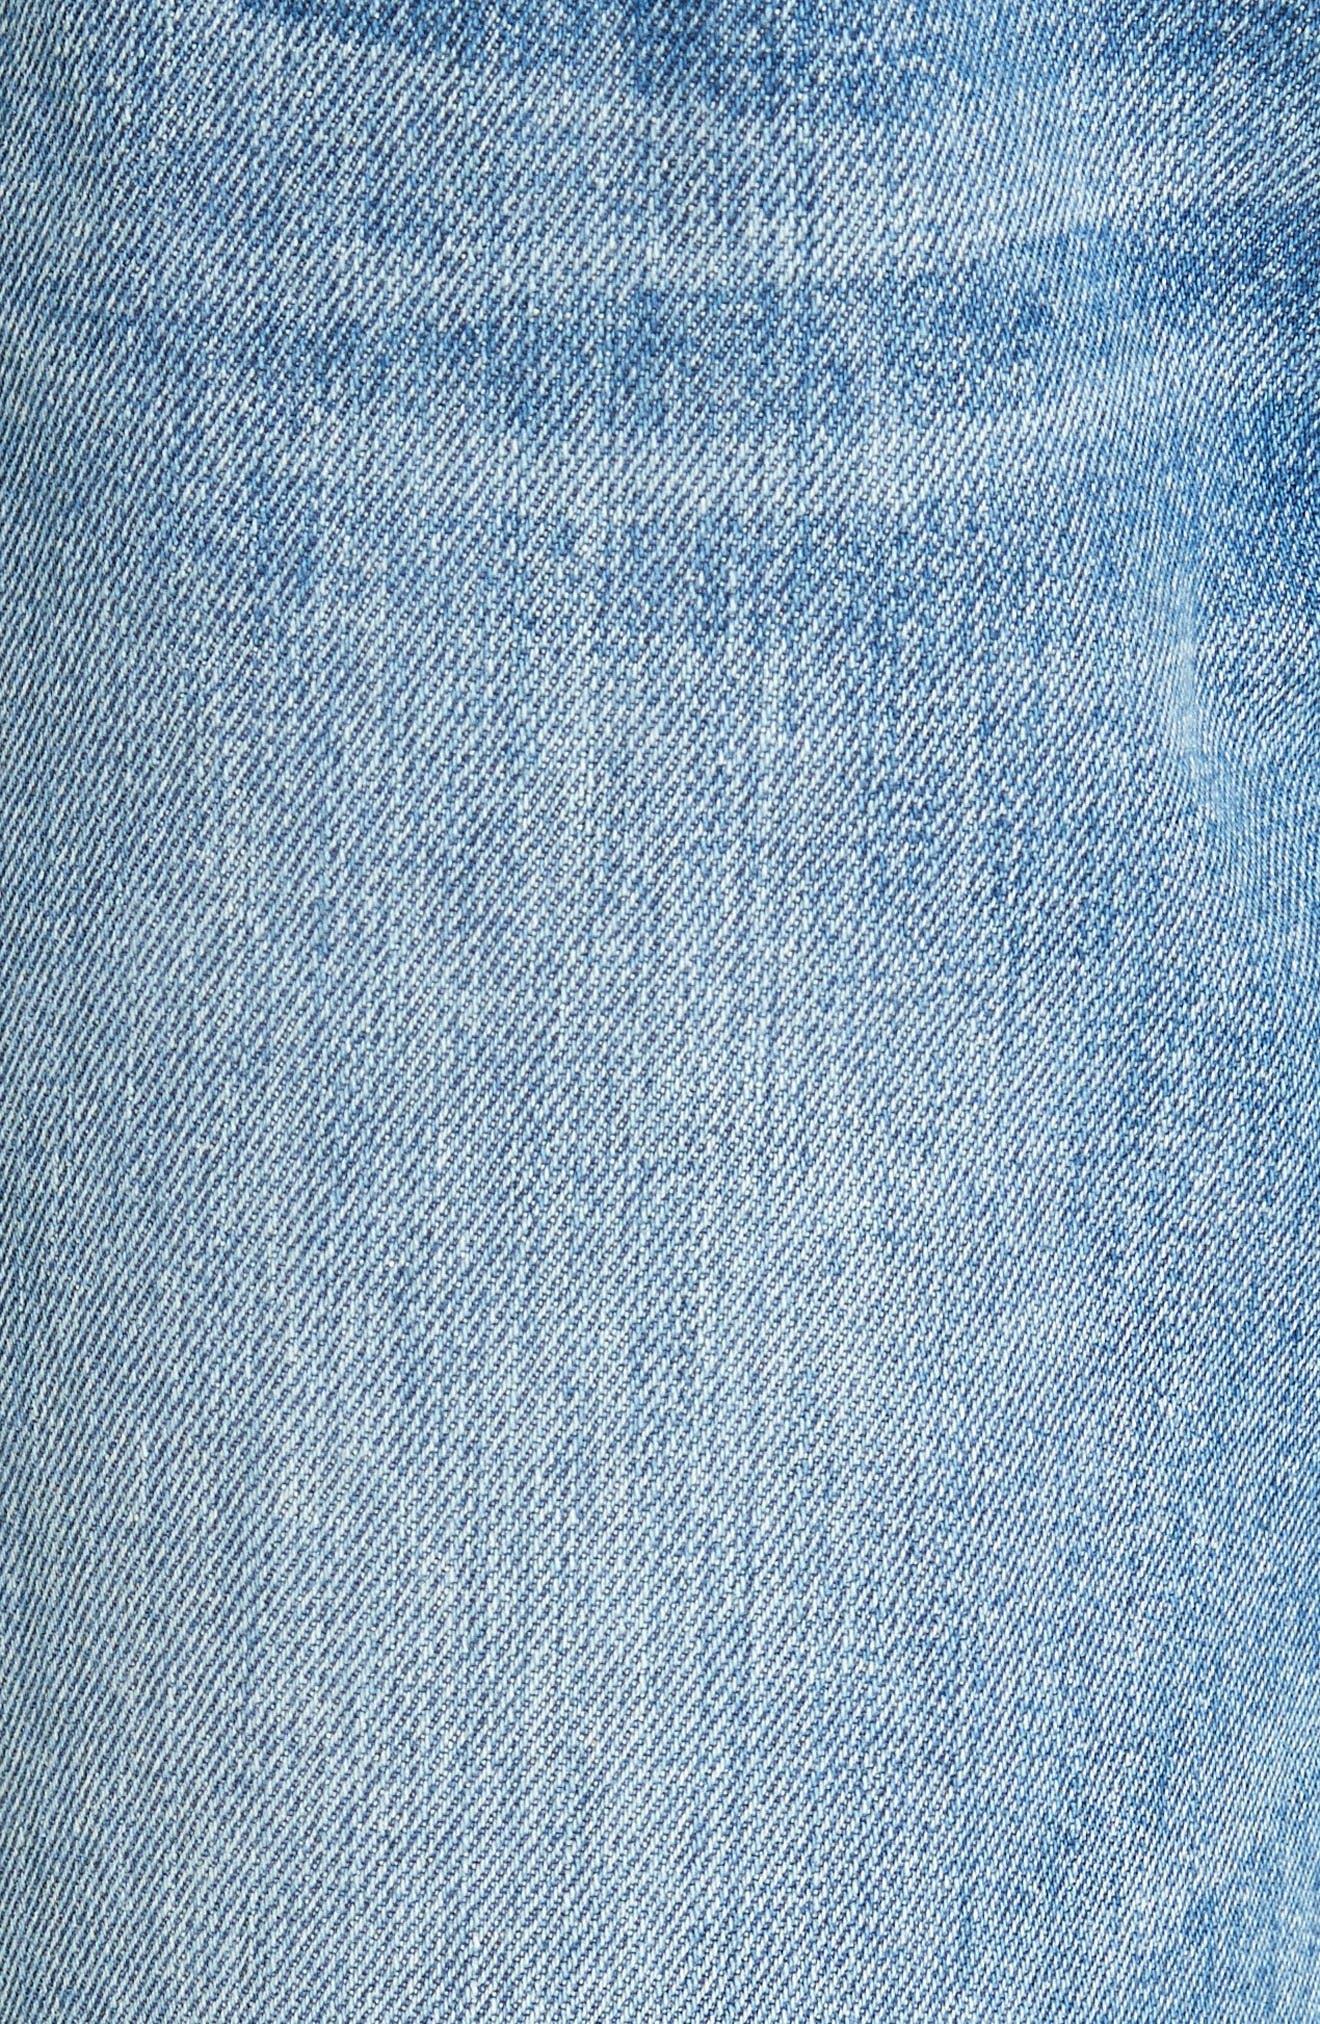 Alternate Image 4  - Derek Lam 10 Crosby Lou High Waist Jeans